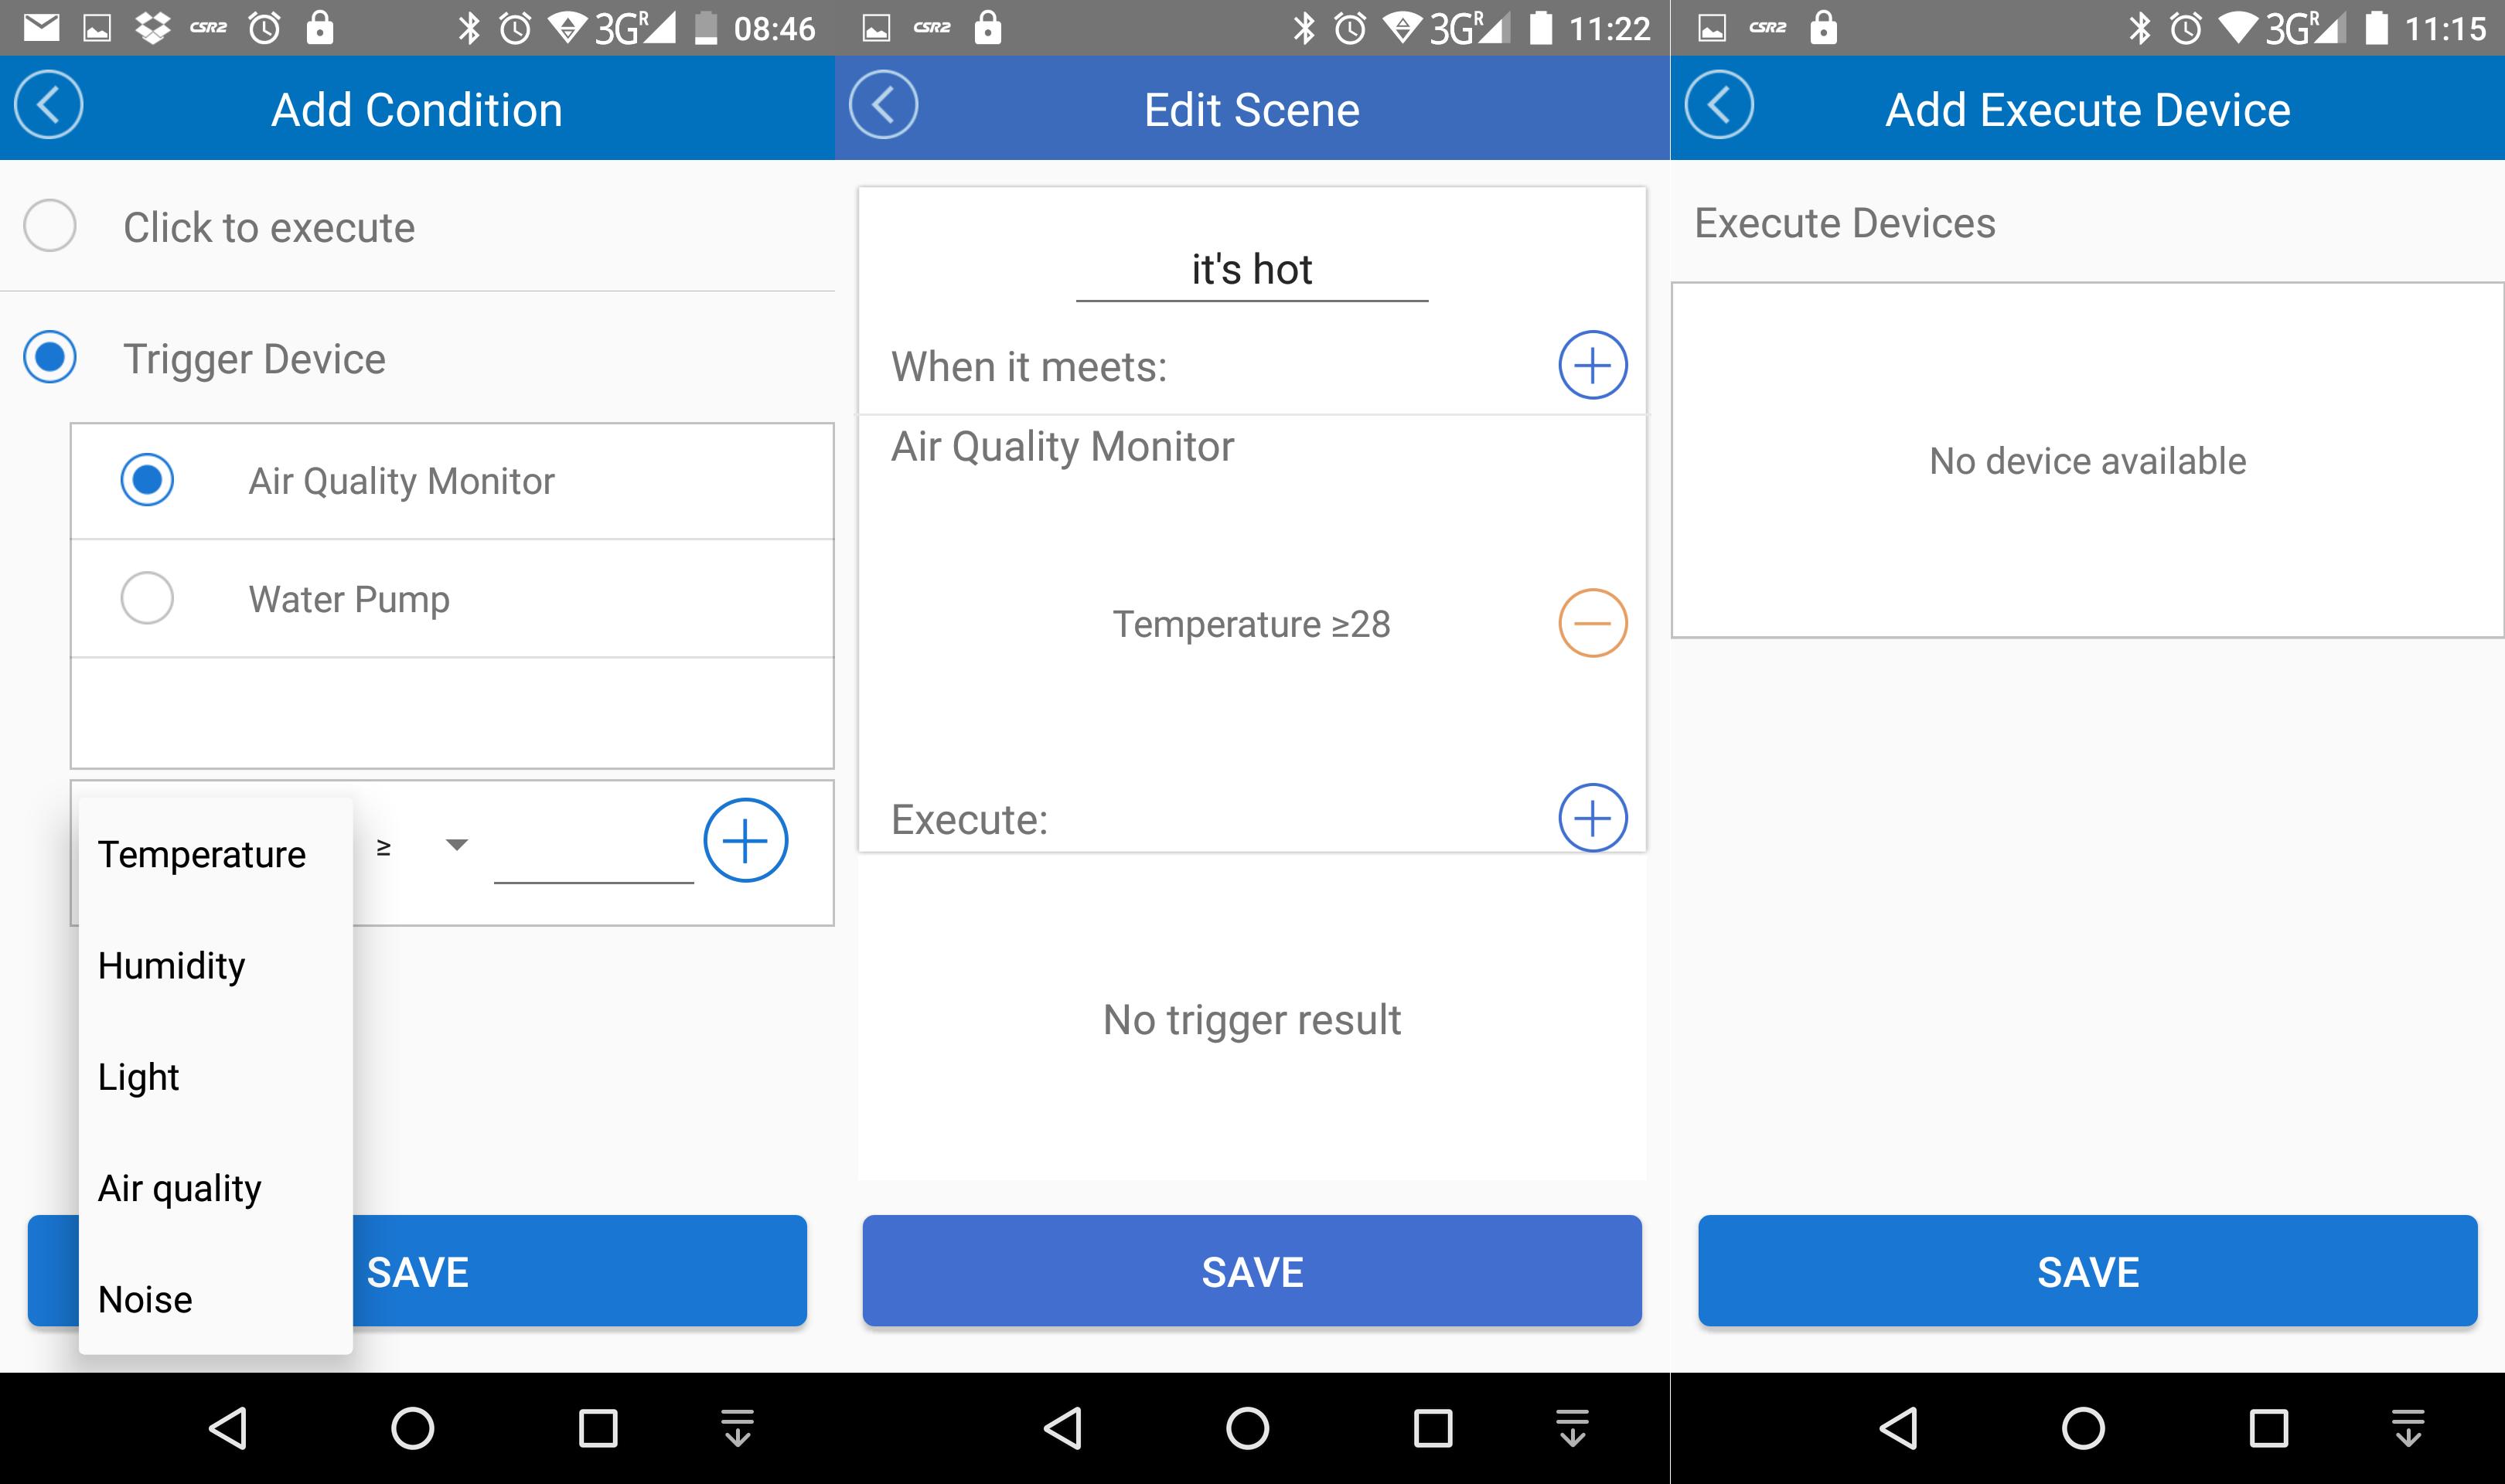 NexGTv Is Live TV Channels App On Tizen Smartphones - Tizen Help